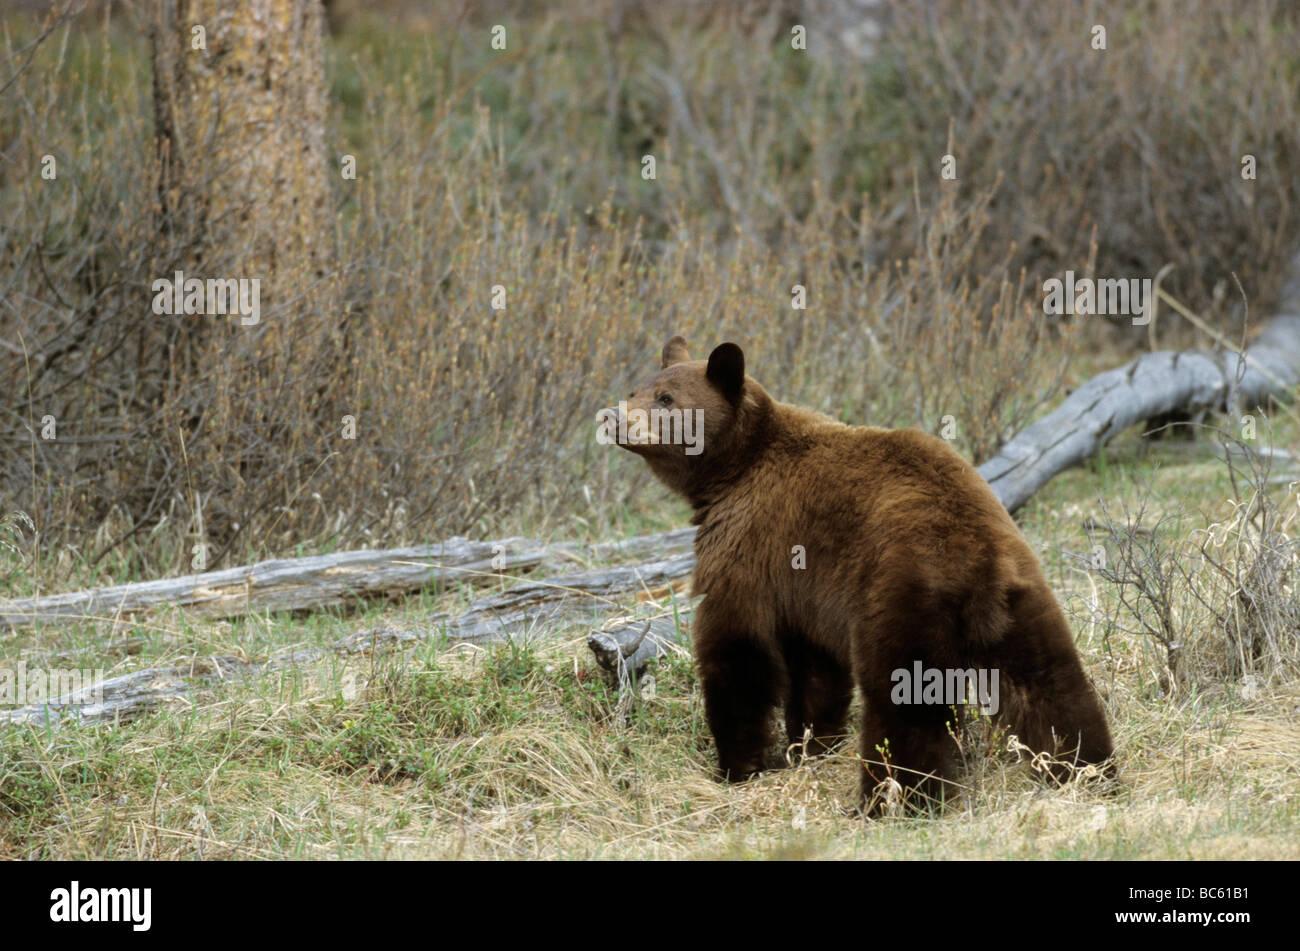 Black bear (Ursus Americanus) standing in forest, Jasper National Park, Alberta, Canada Stock Photo